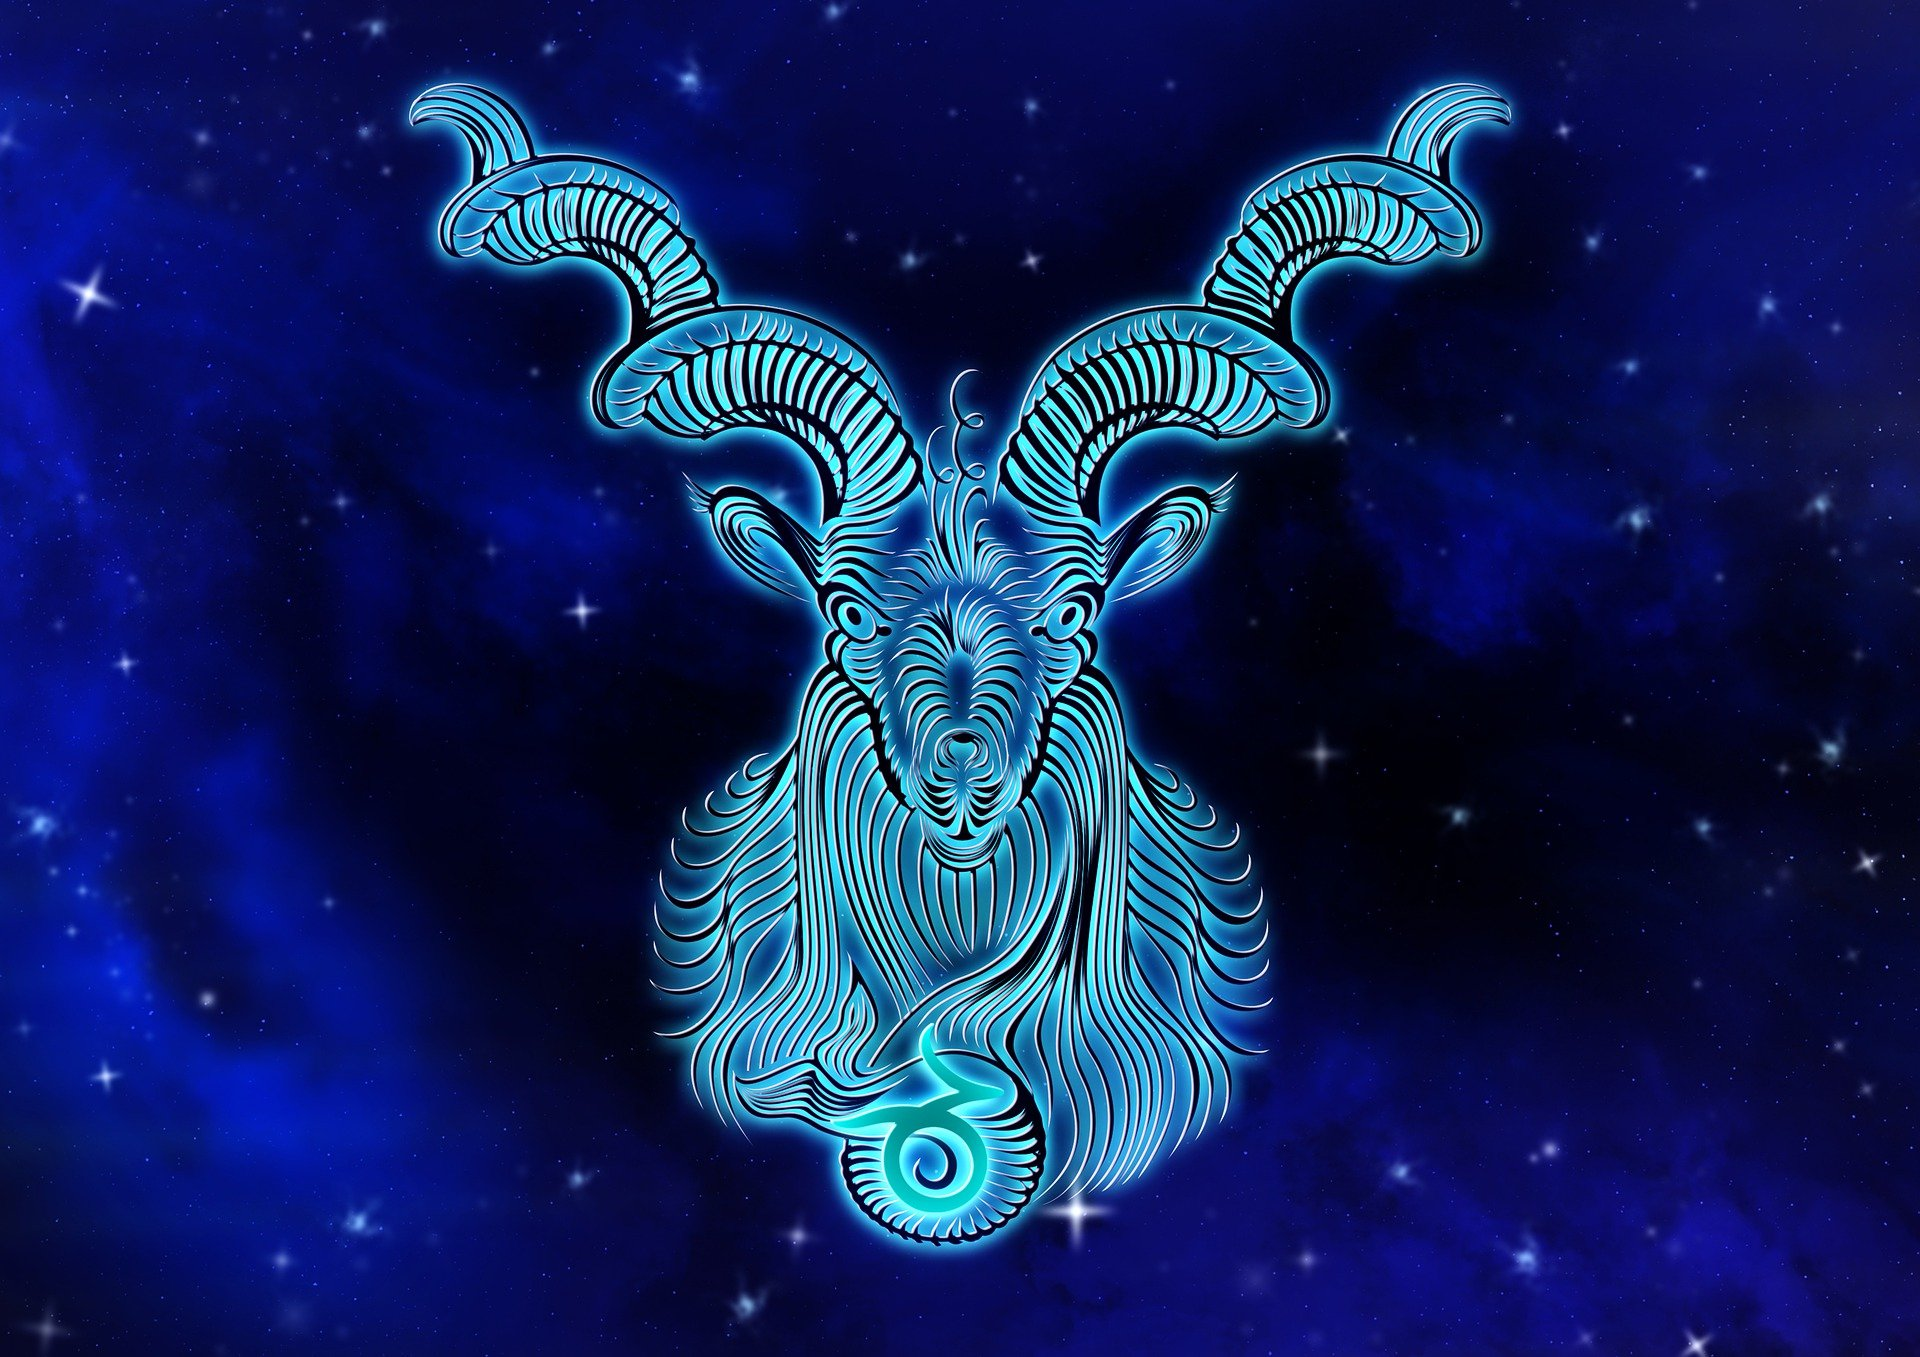 Horoscop Berbec azi, 7 iulie 2021. Berbecii vor mai mult spațiu doar pentru ei